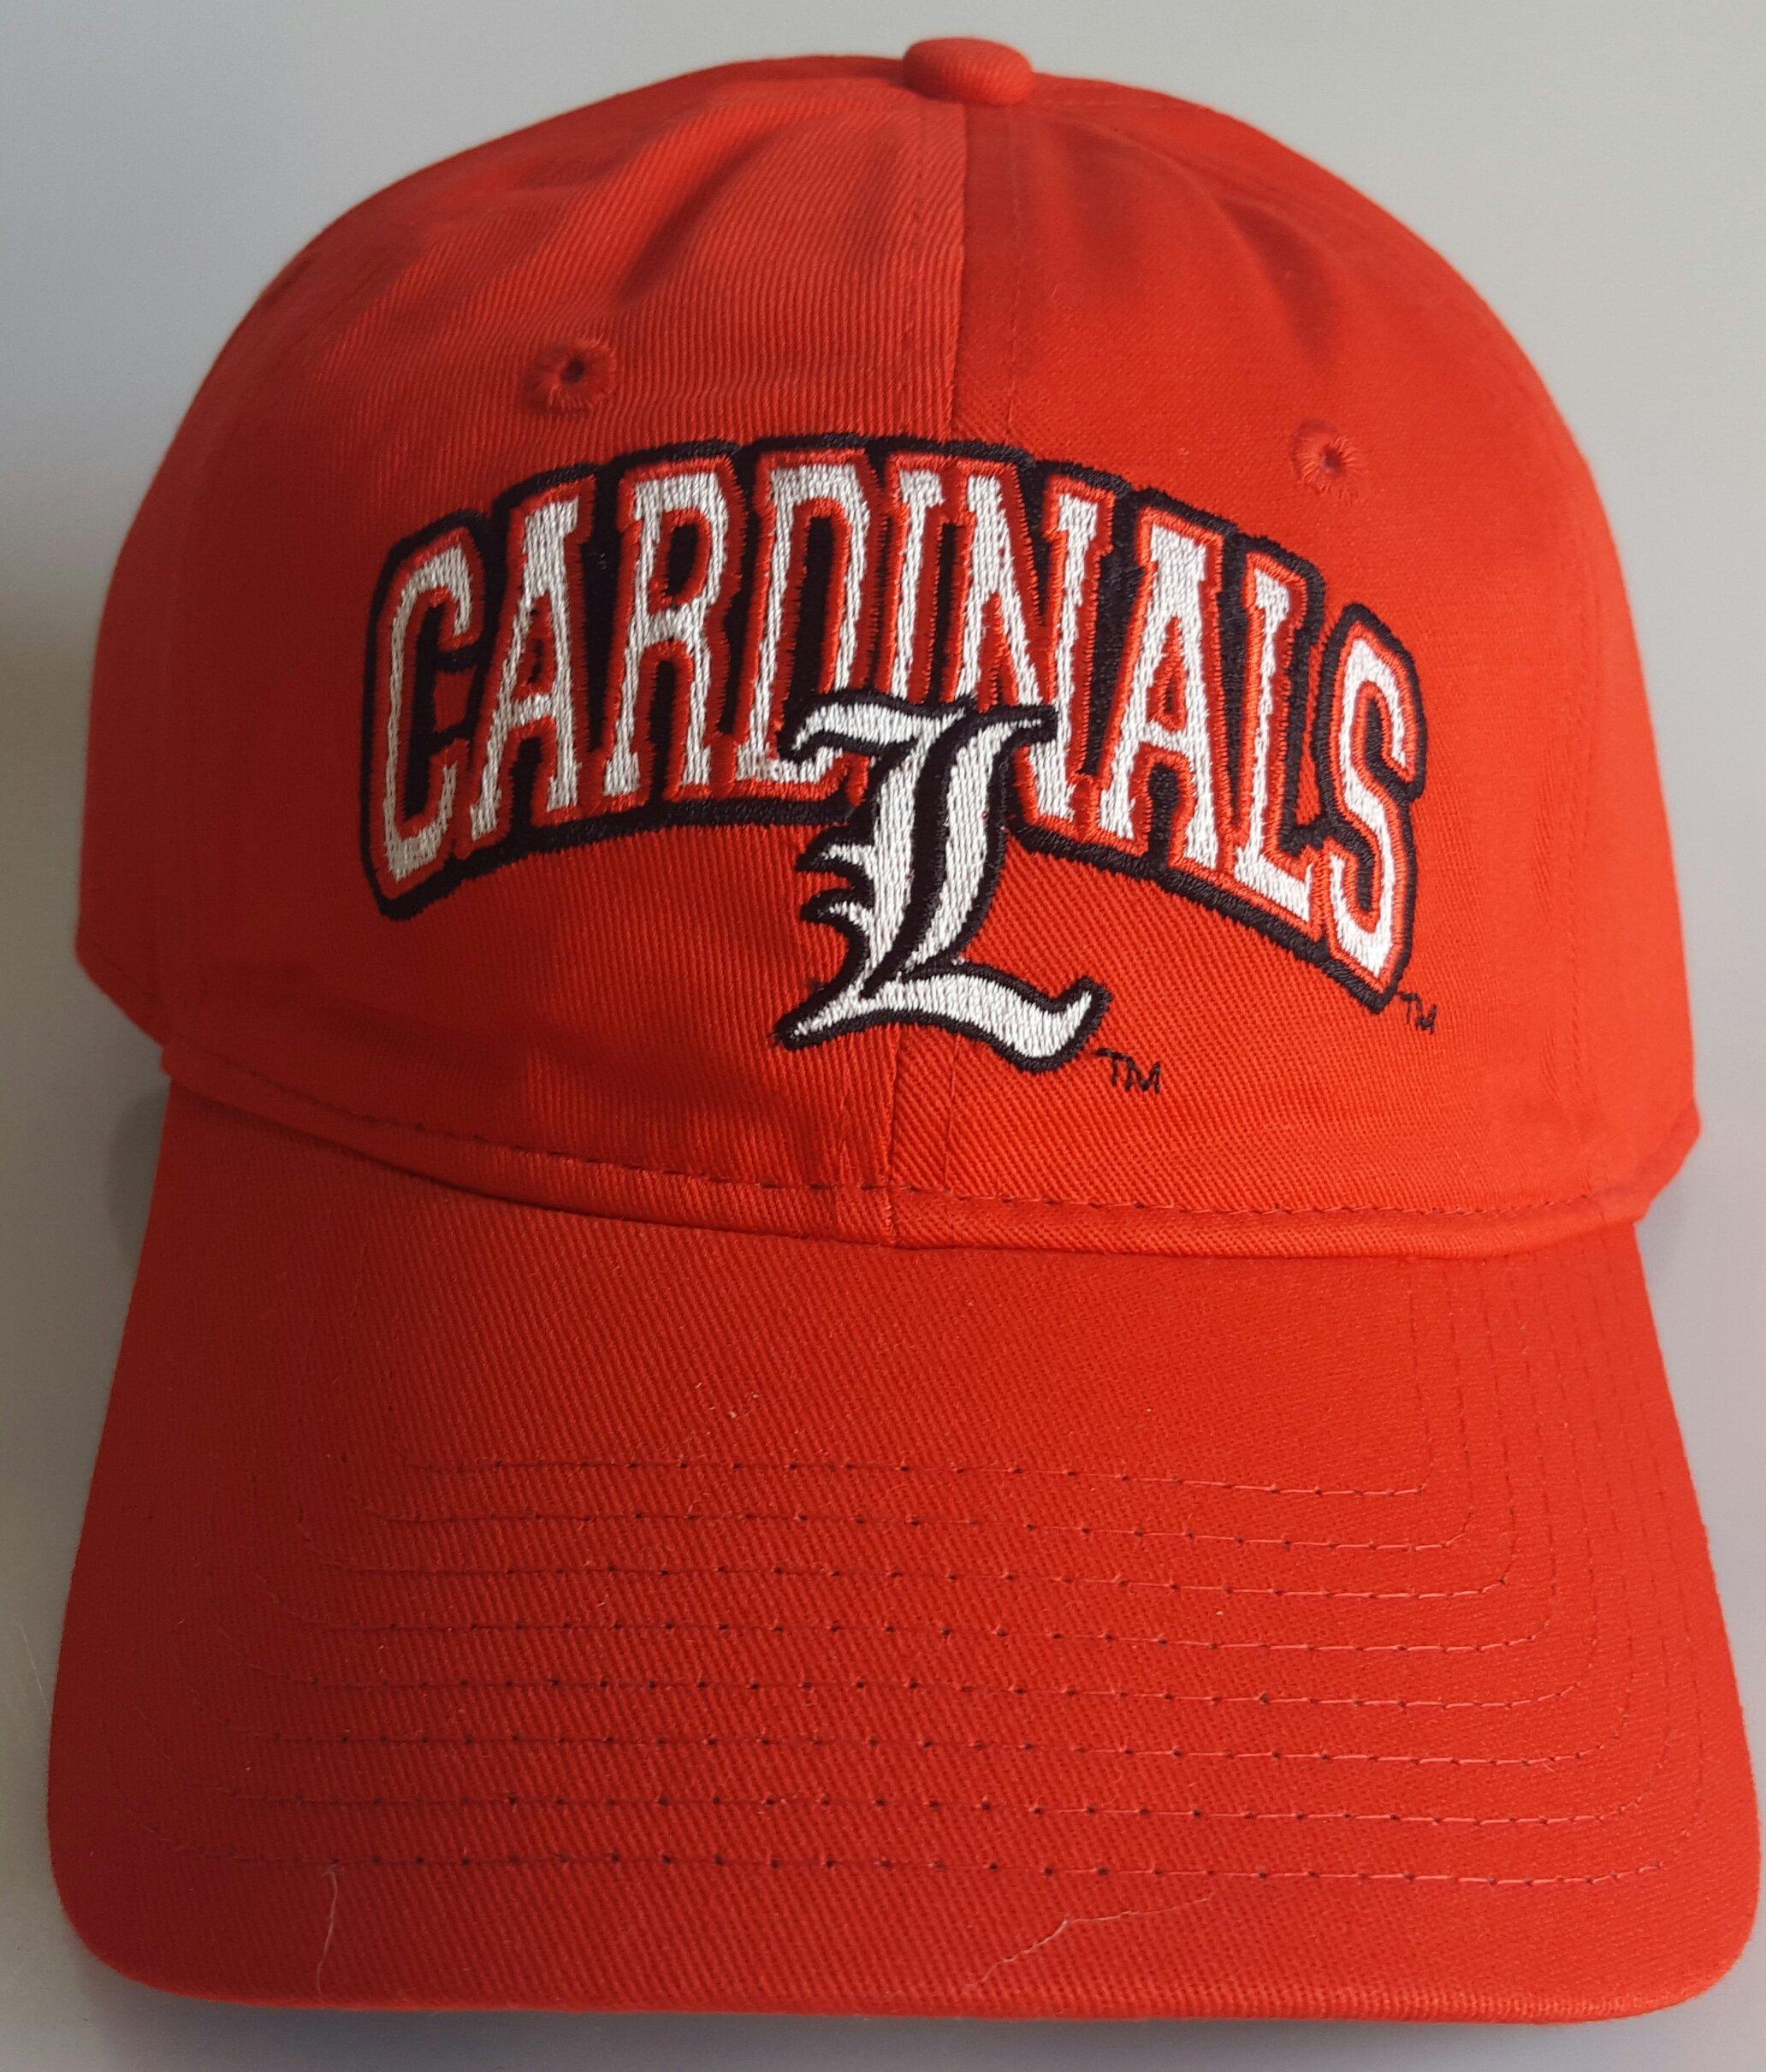 NCAA New University of Louisville Embroidered Adjustable Buckle Cap